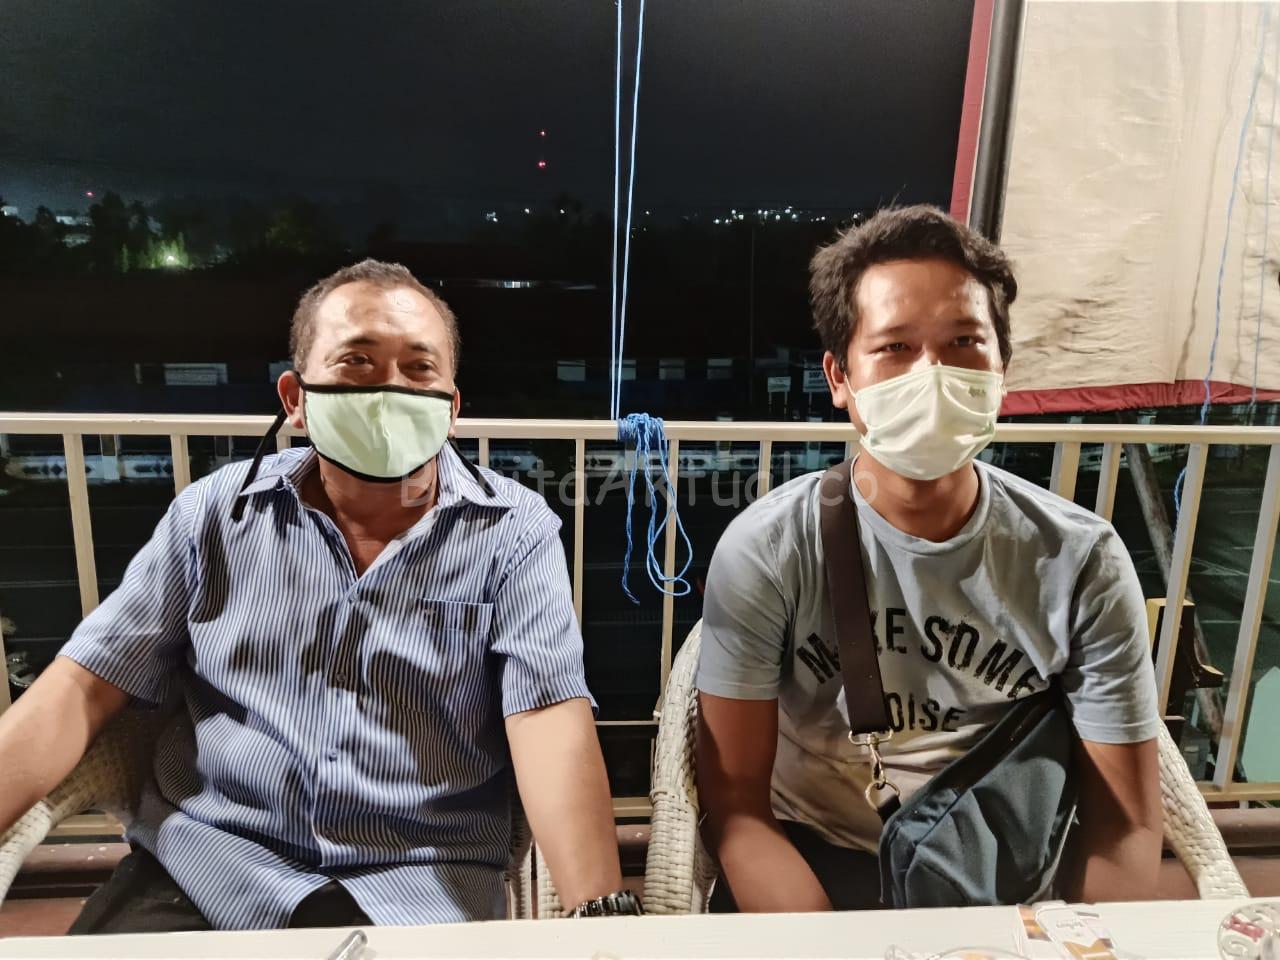 Polres Manokwari Bersama Polda PB Berhasil Tangkap 10 Pelaku Begal Yang Berusia Dibawah Umur 1 IMG 20200506 WA0029